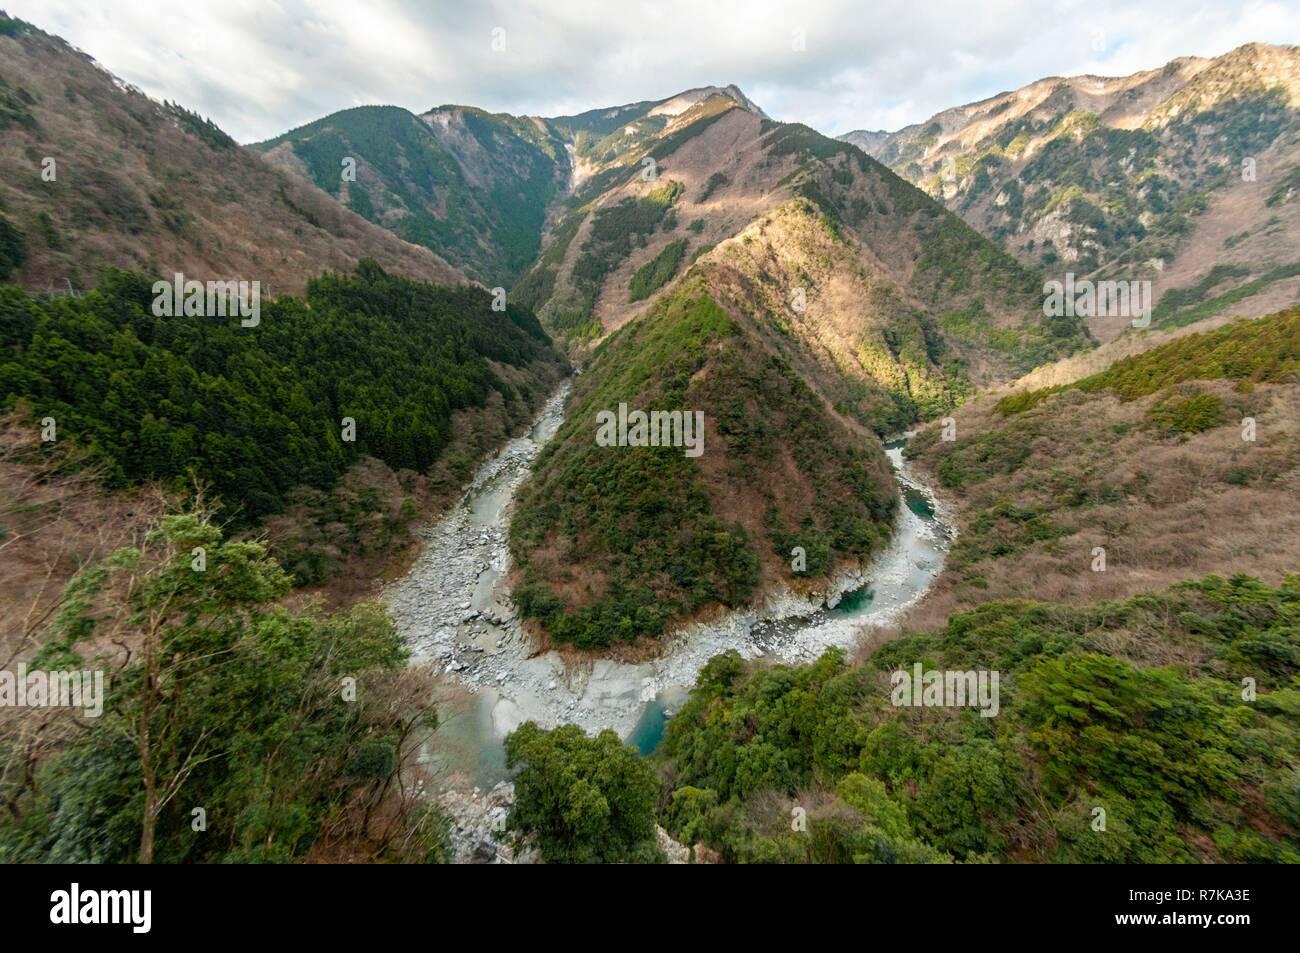 Le Japon, l'île de Shikoku, Préfecture Tokushima, Hinoji Valley Photo Stock